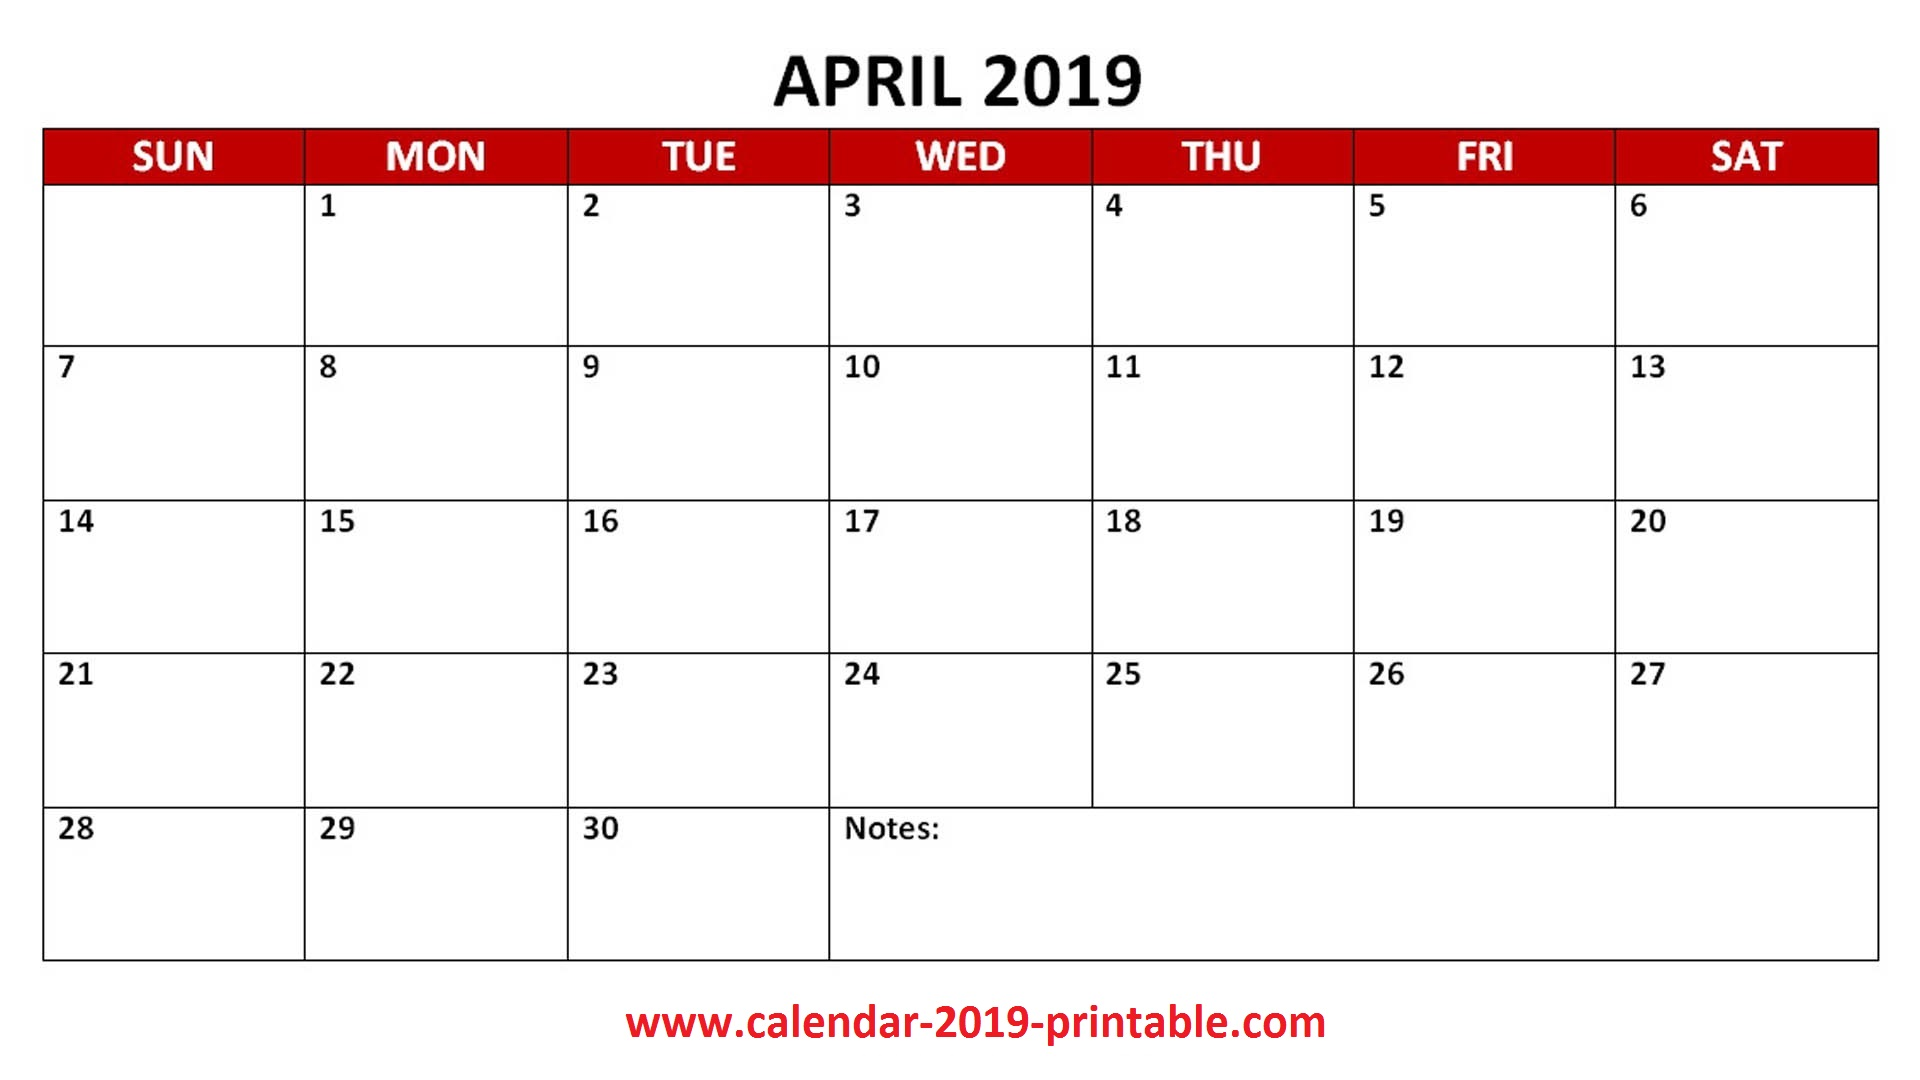 April 2019 Printable Calendar PDF